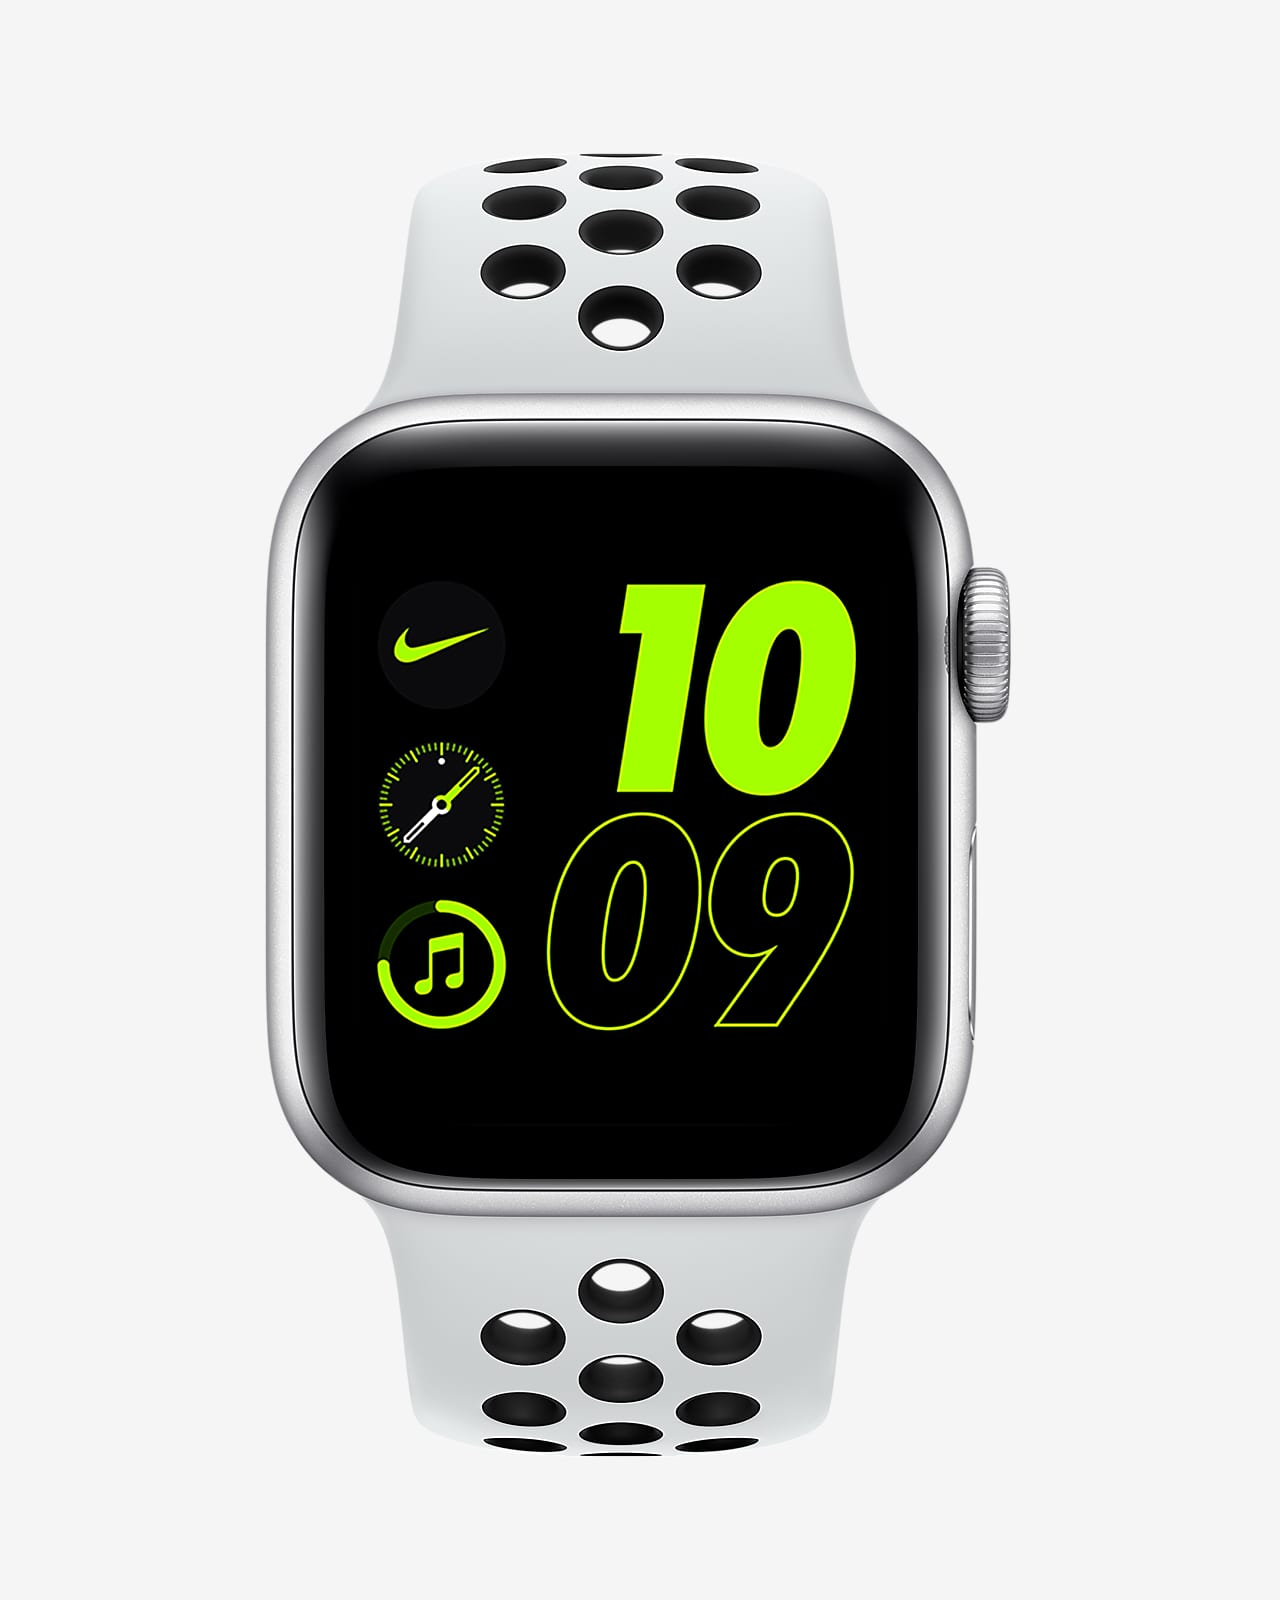 Florecer molestarse diversión  Apple Watch Nike Series 6 (GPS + Cellular) with Nike Sport Band 40mm Silver  Aluminum Case. Nike.com